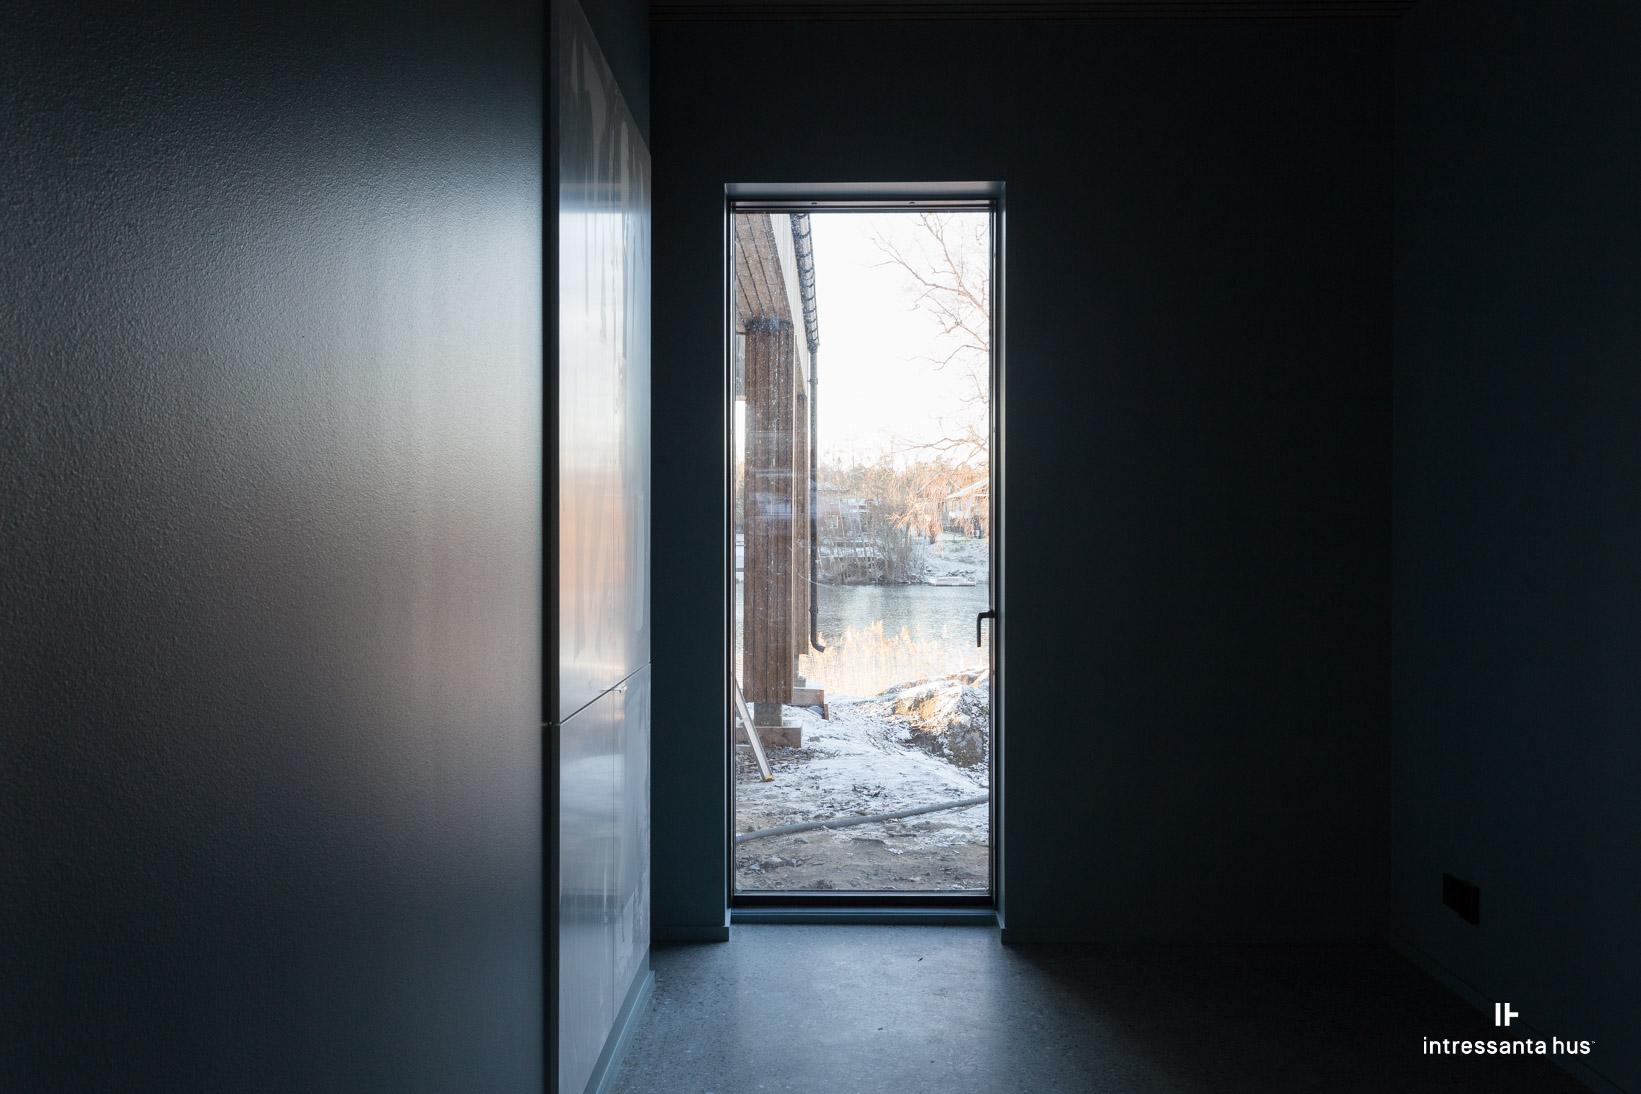 intressantahus-house1-075